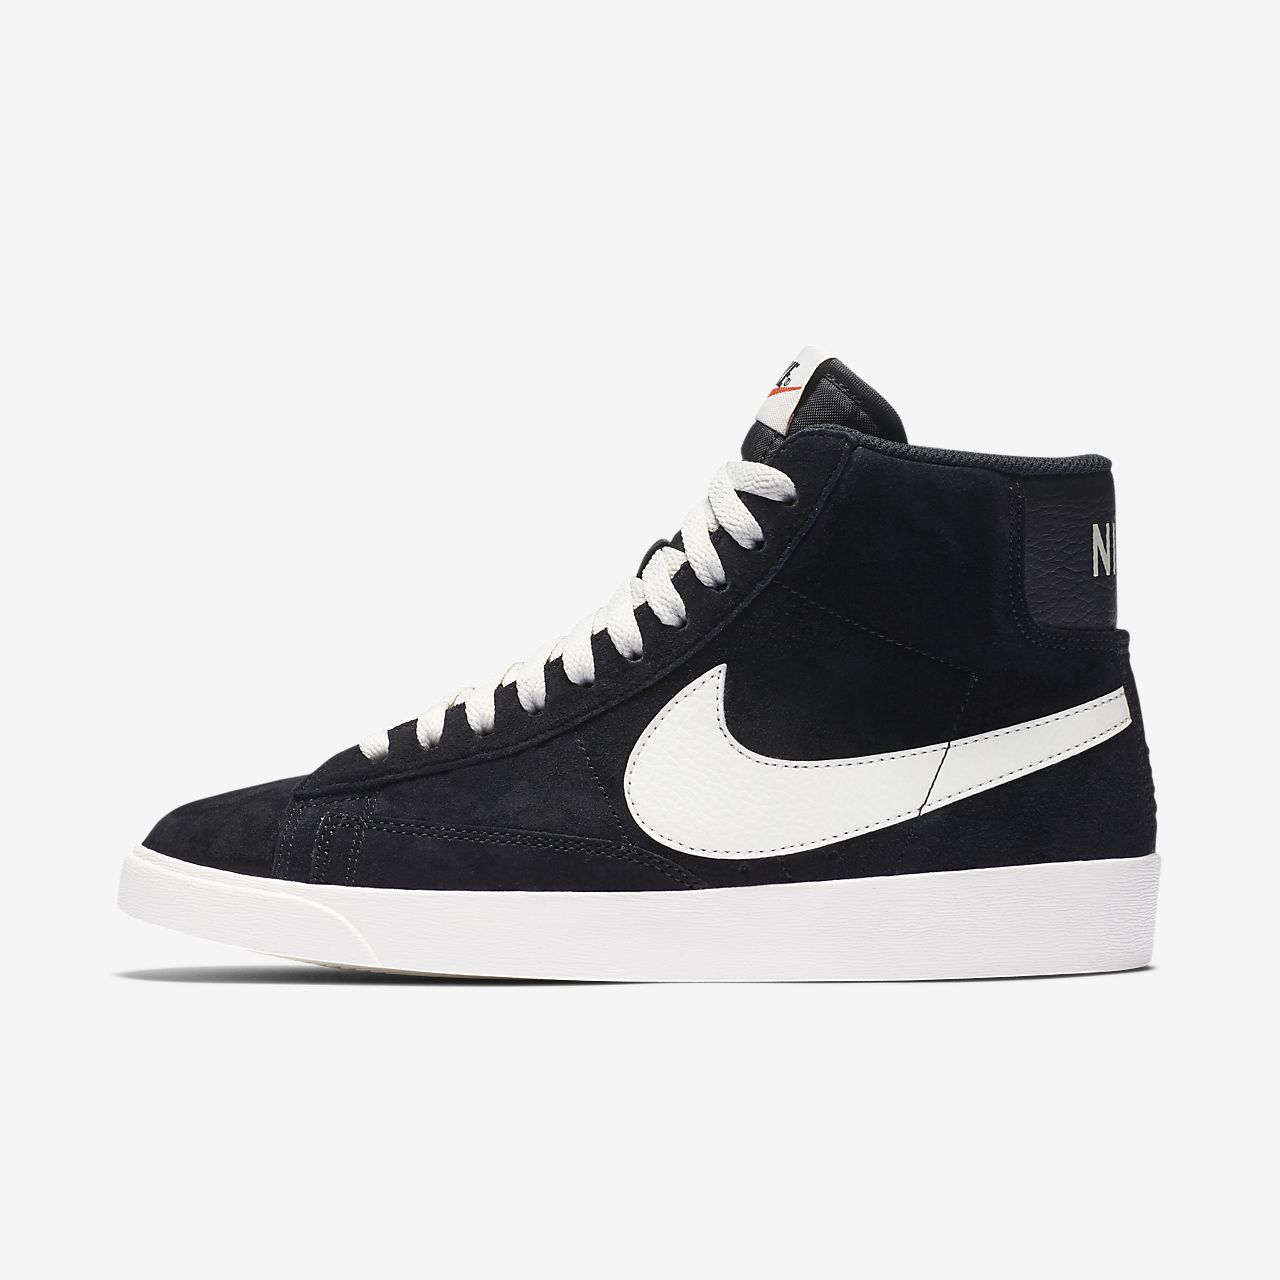 Nike Blazer Mid Vintage Suede 女子运动鞋